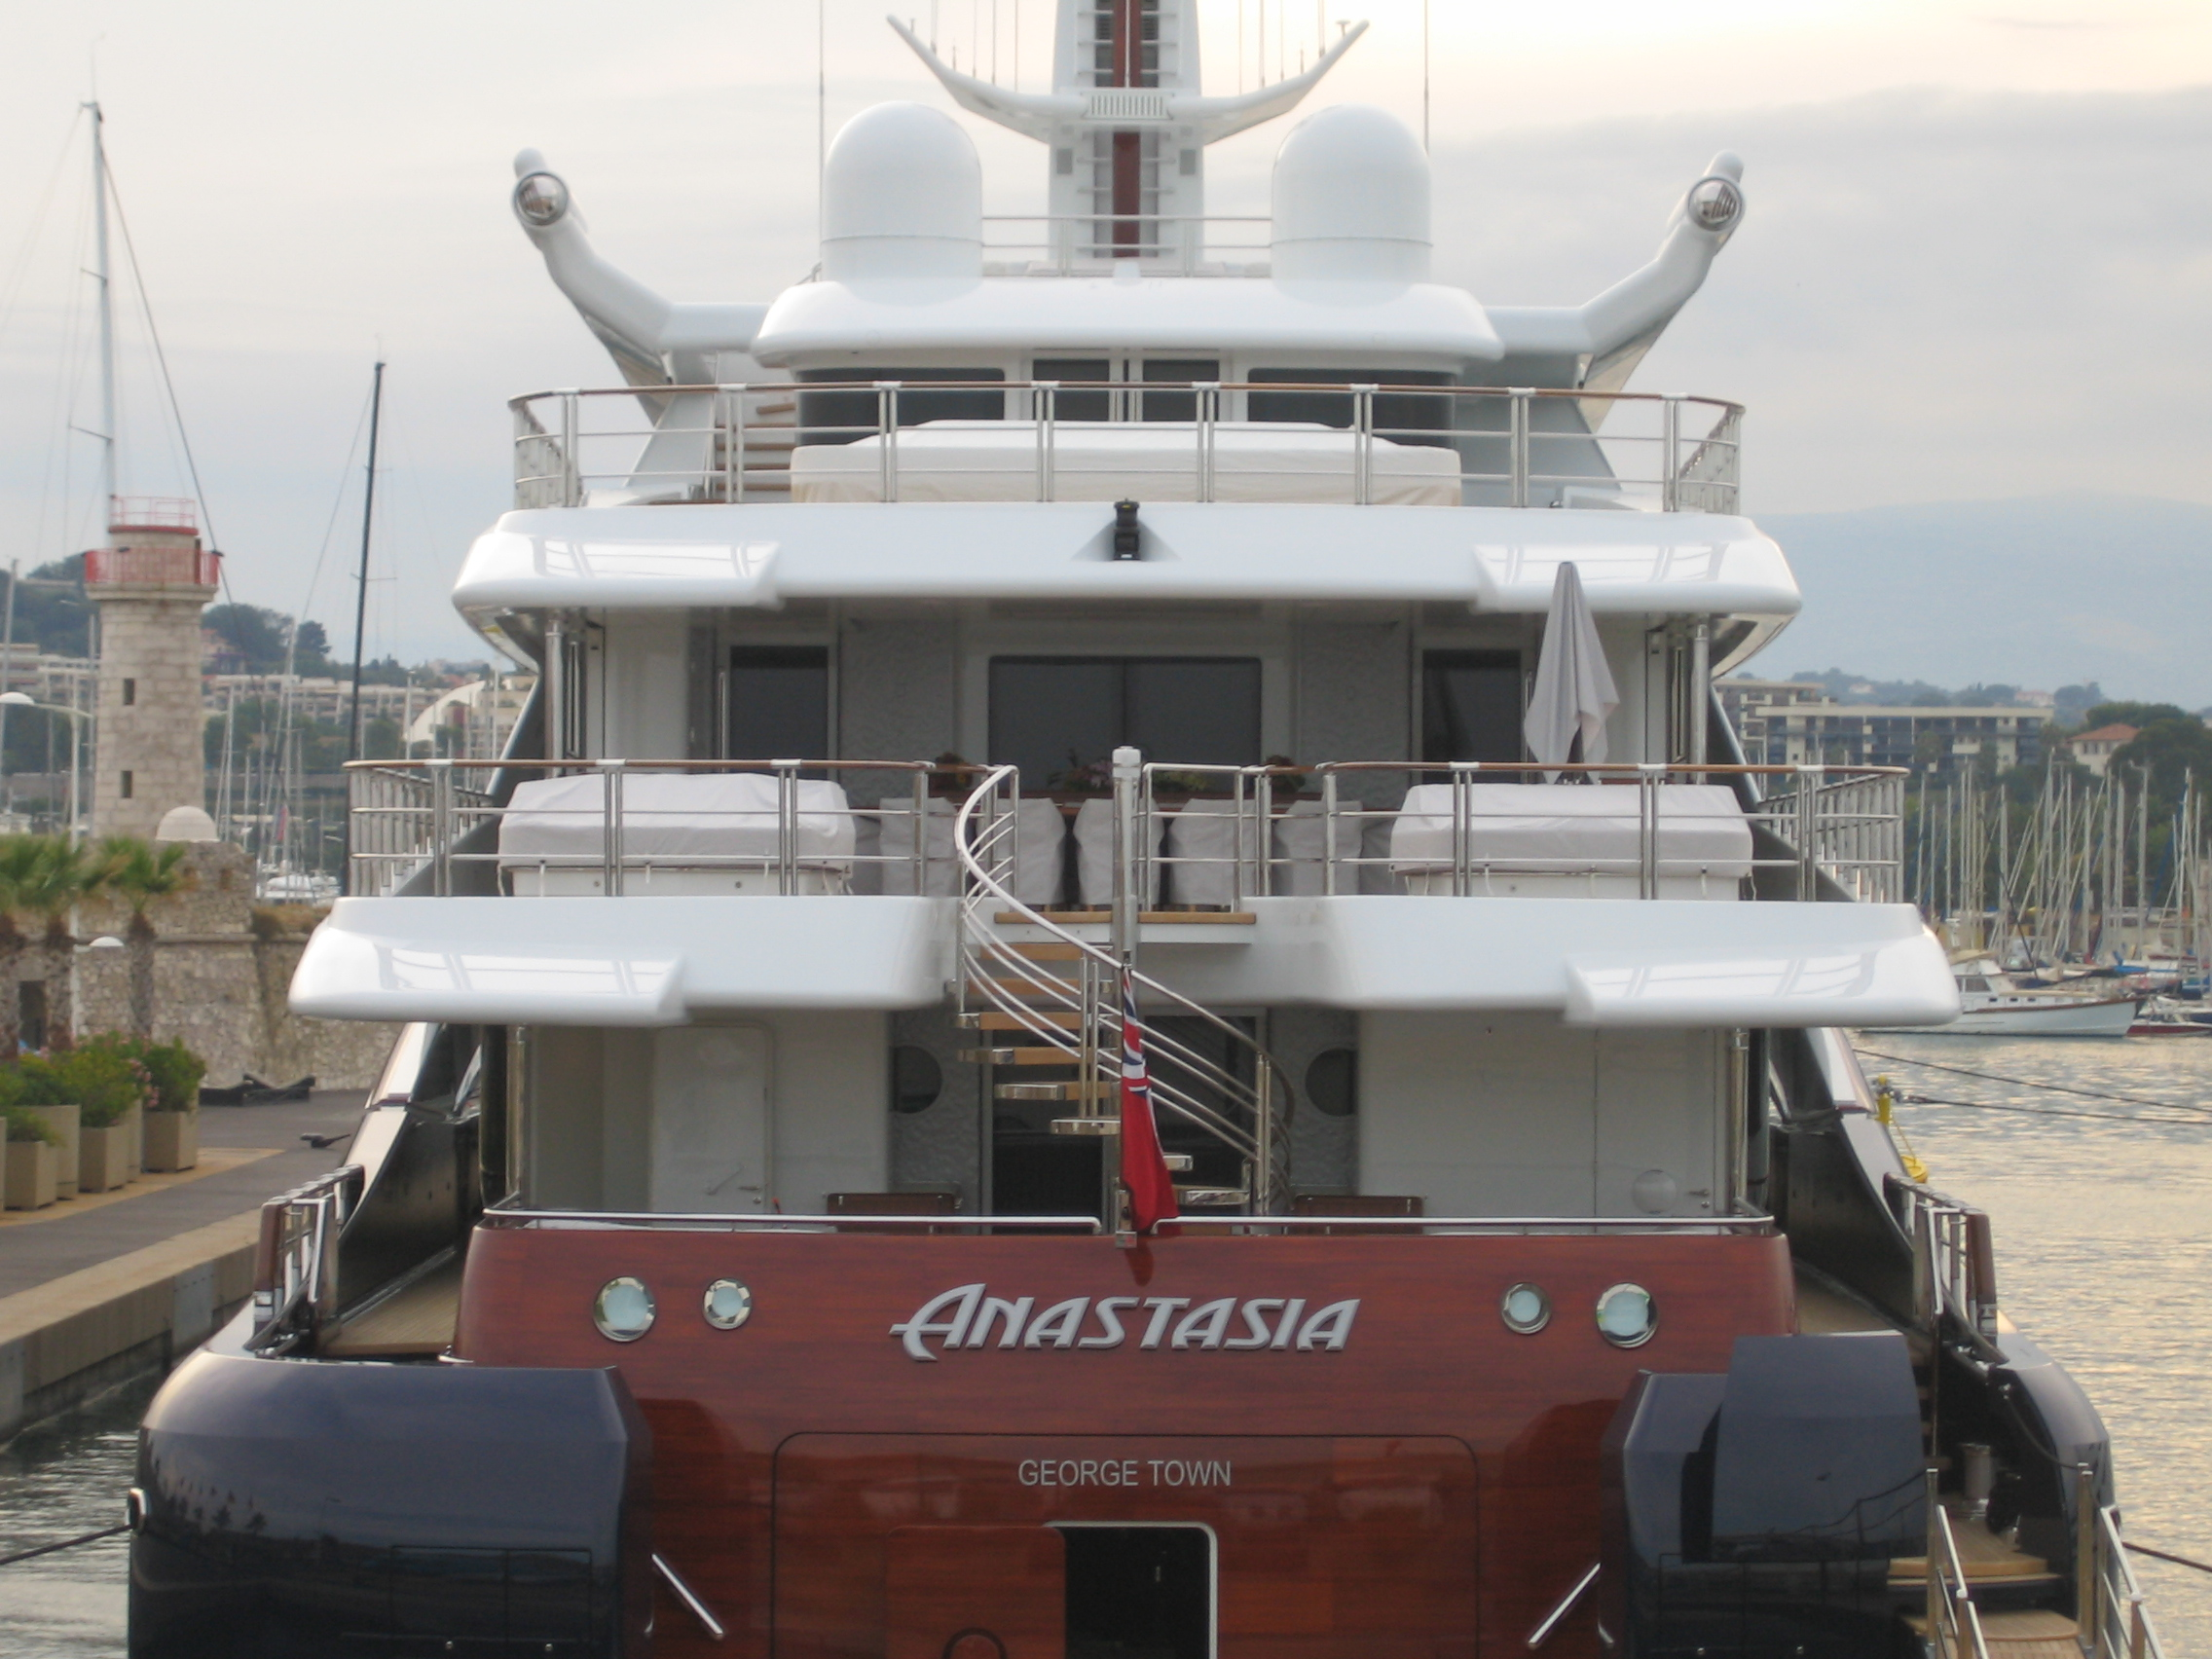 Anastasia Yacht Wikipedia